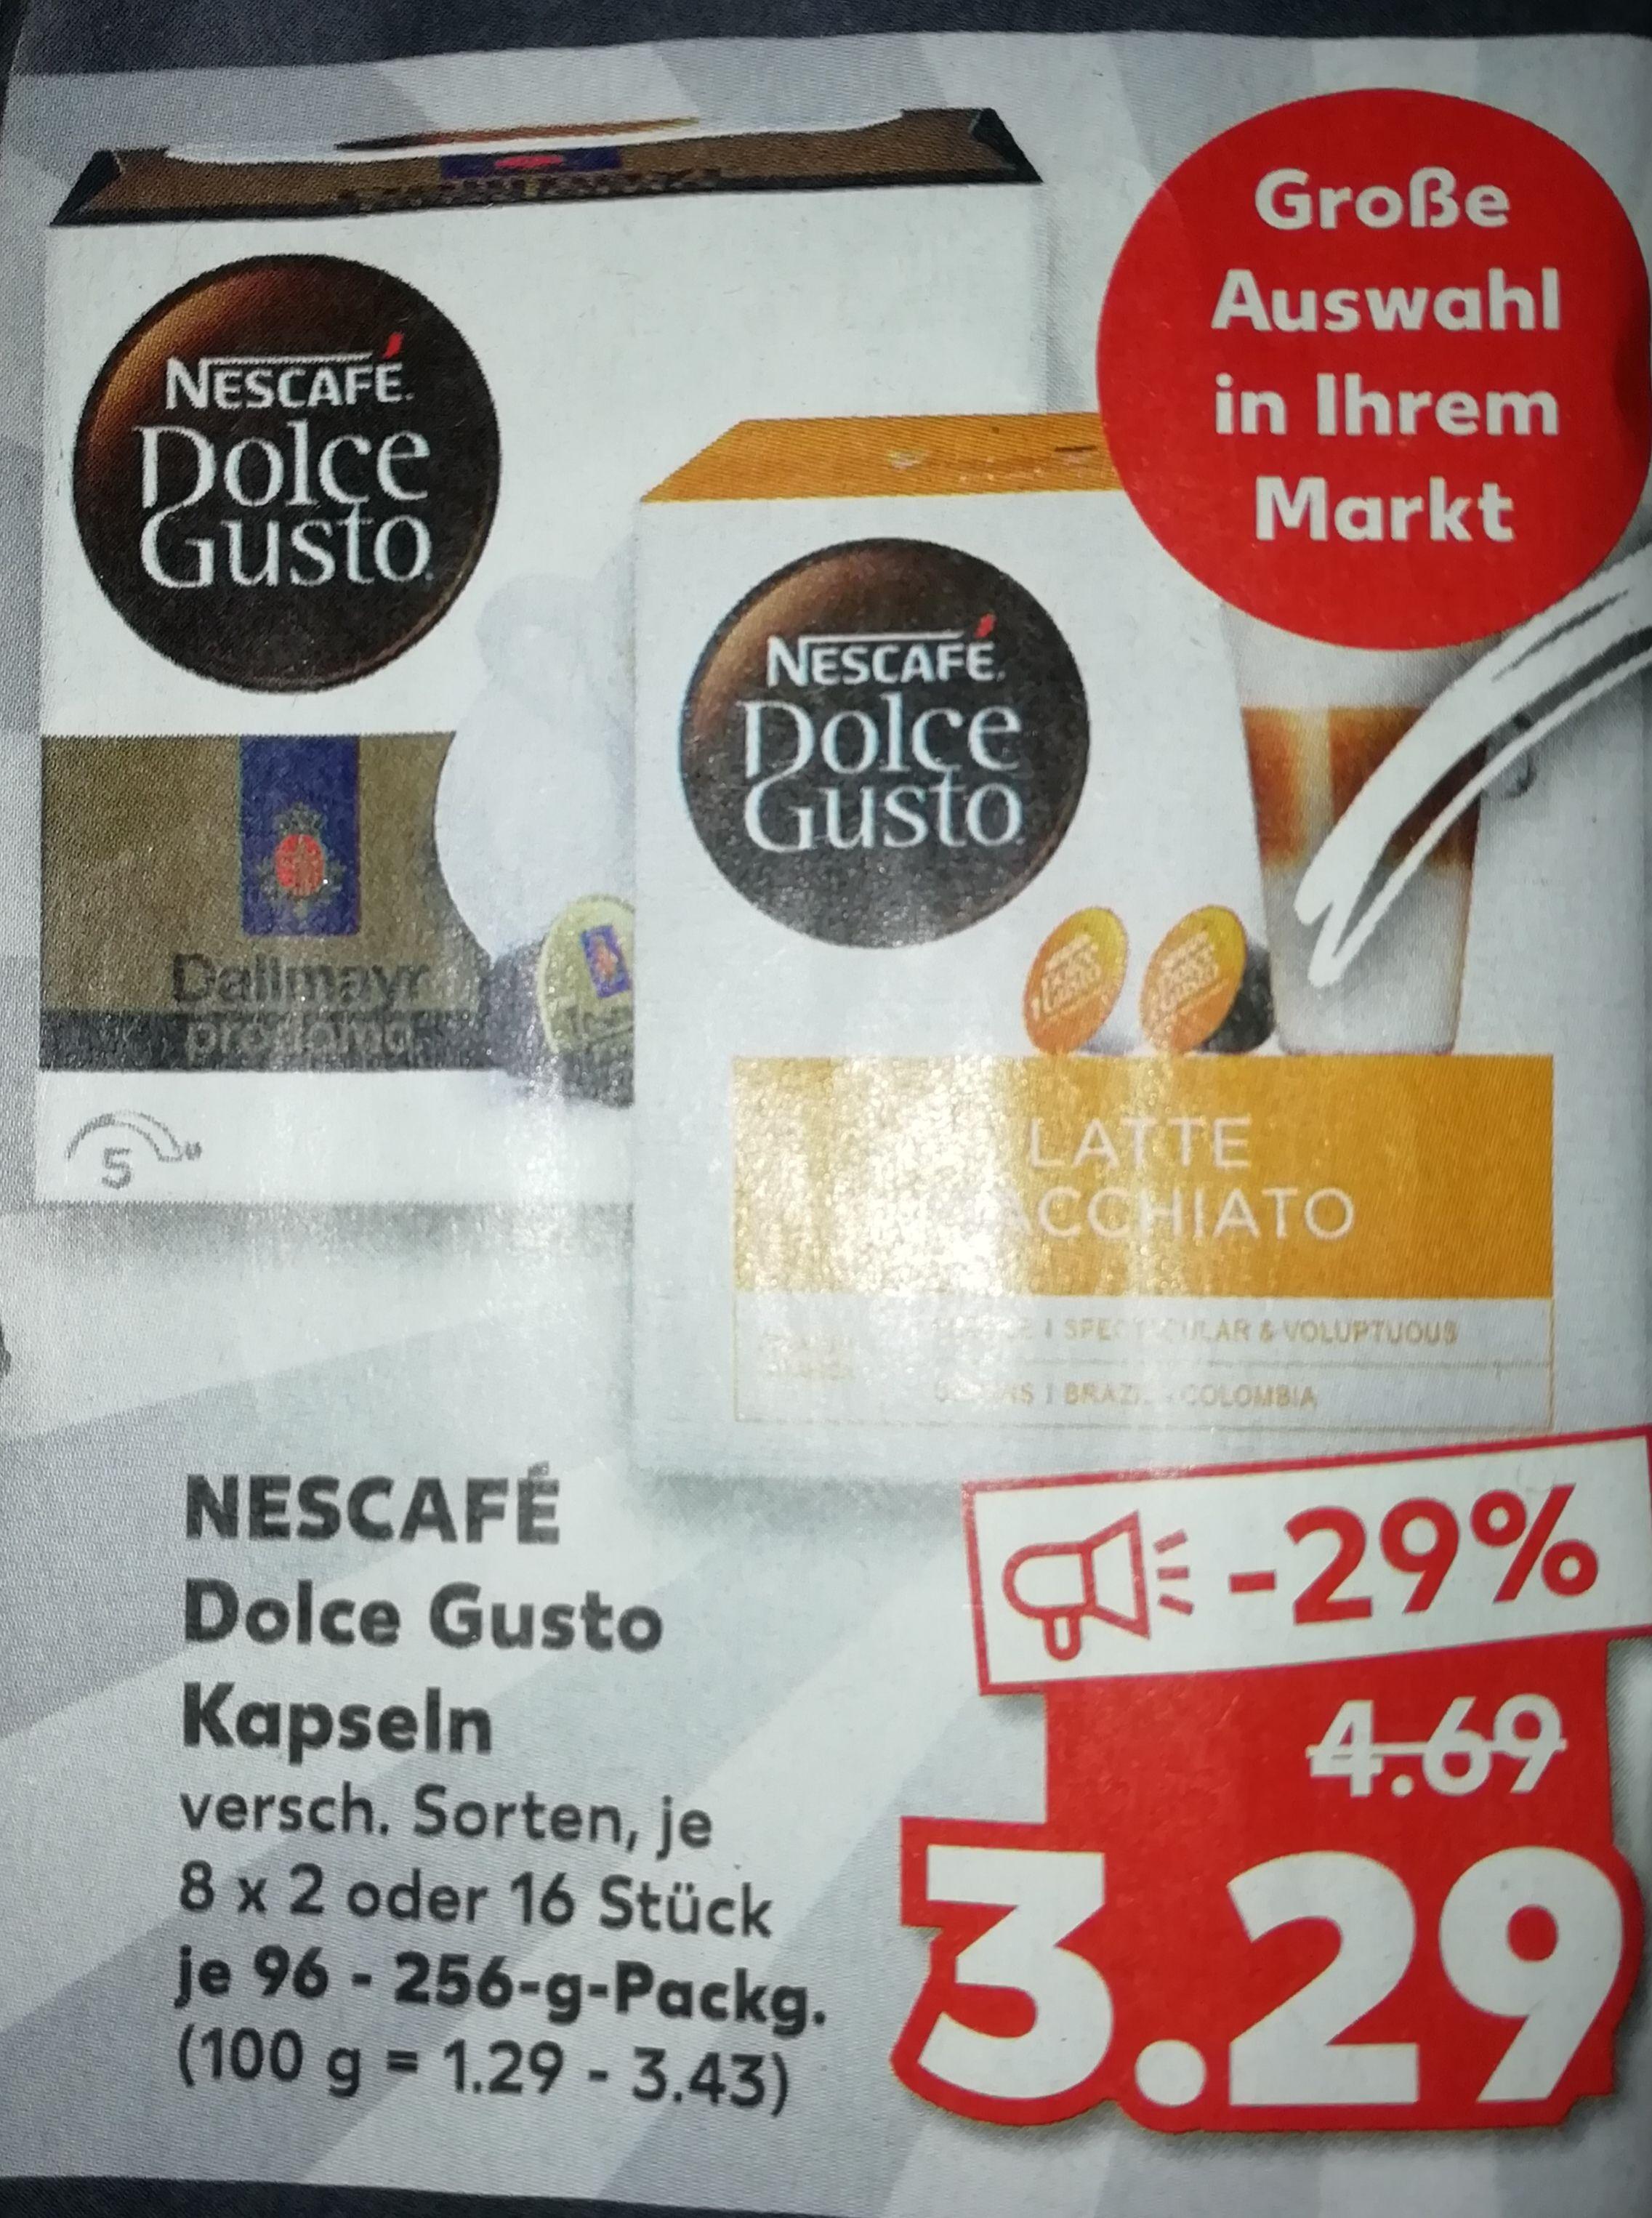 [Kaufland] Nescafe Dolce Gusto Kapseln